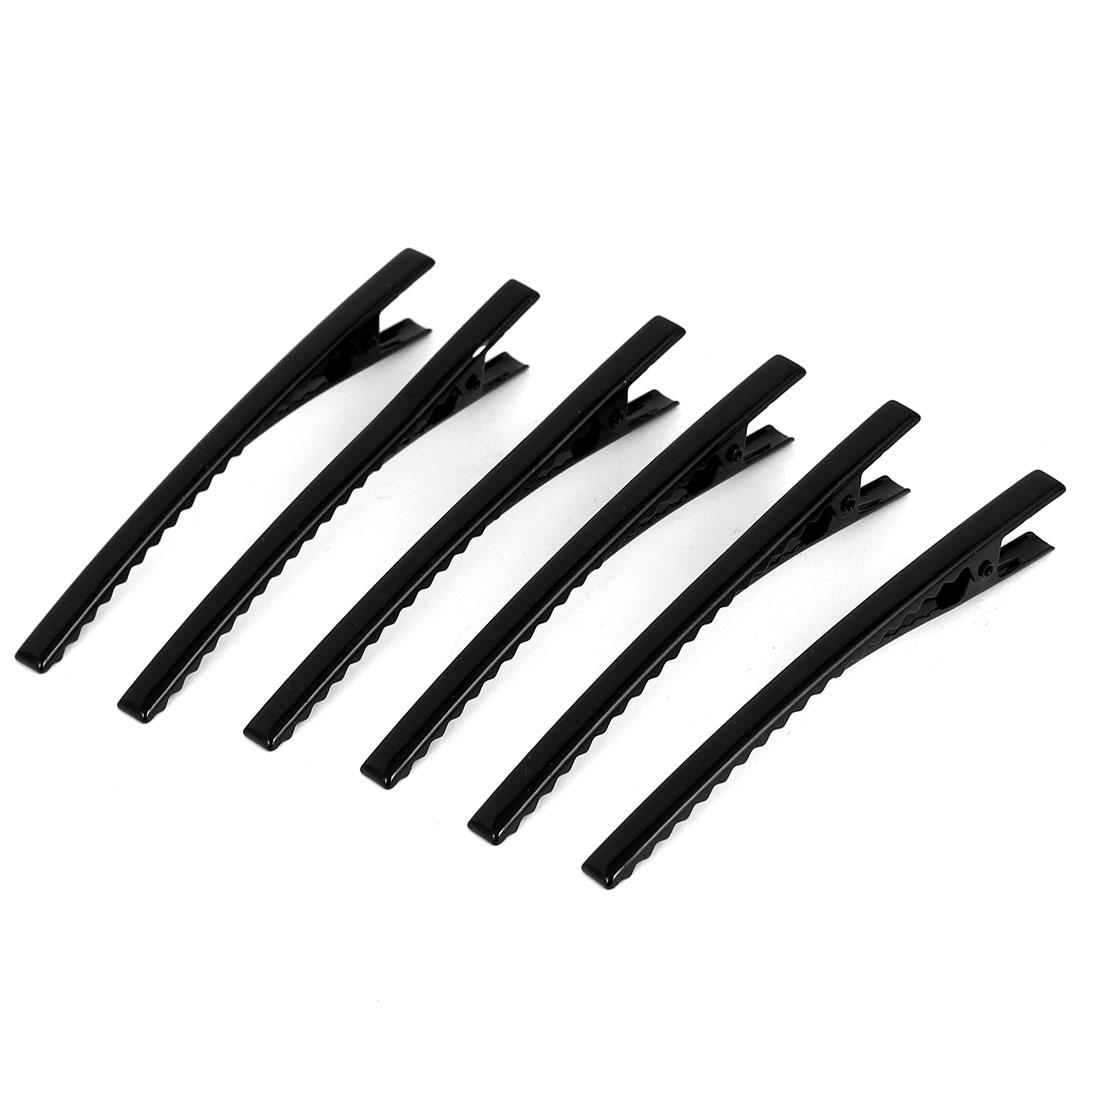 Metal Single Prong Alligator Hair Clip Teeth Barrette Hairpin Black 6pcs